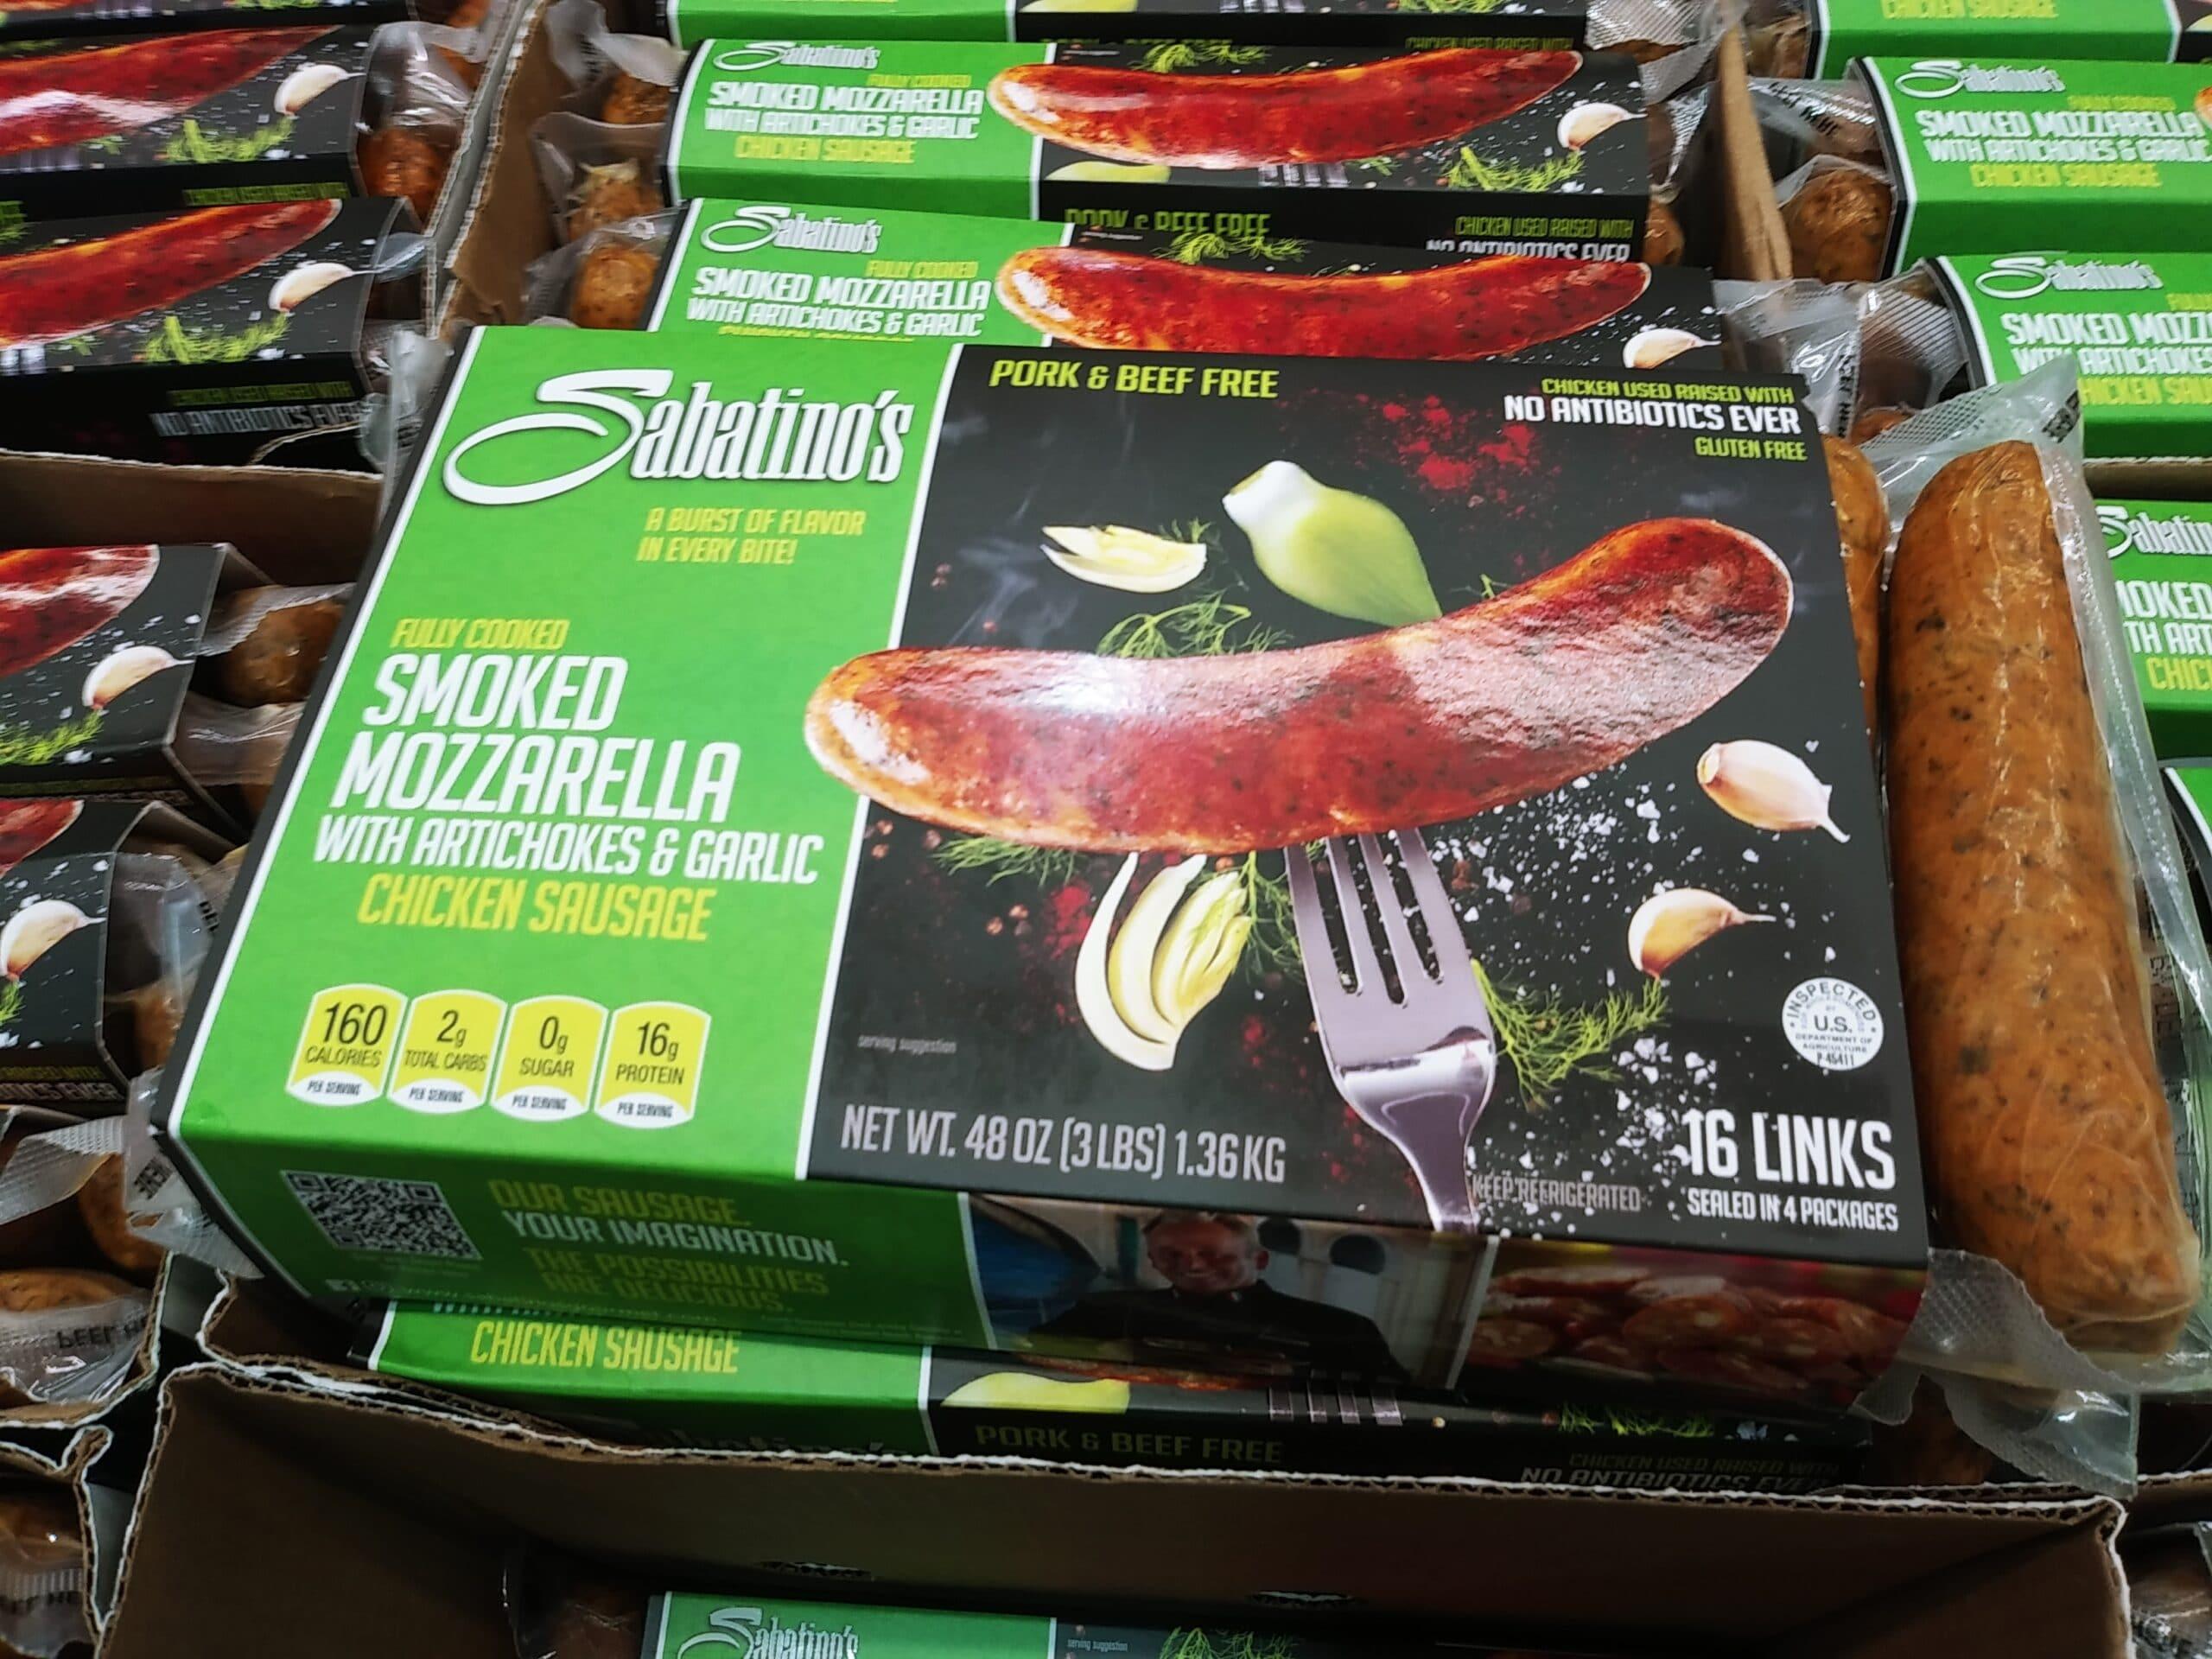 Sabatinos Smoked Chicken Mozzarella Sausage 2pk $6.49 Each